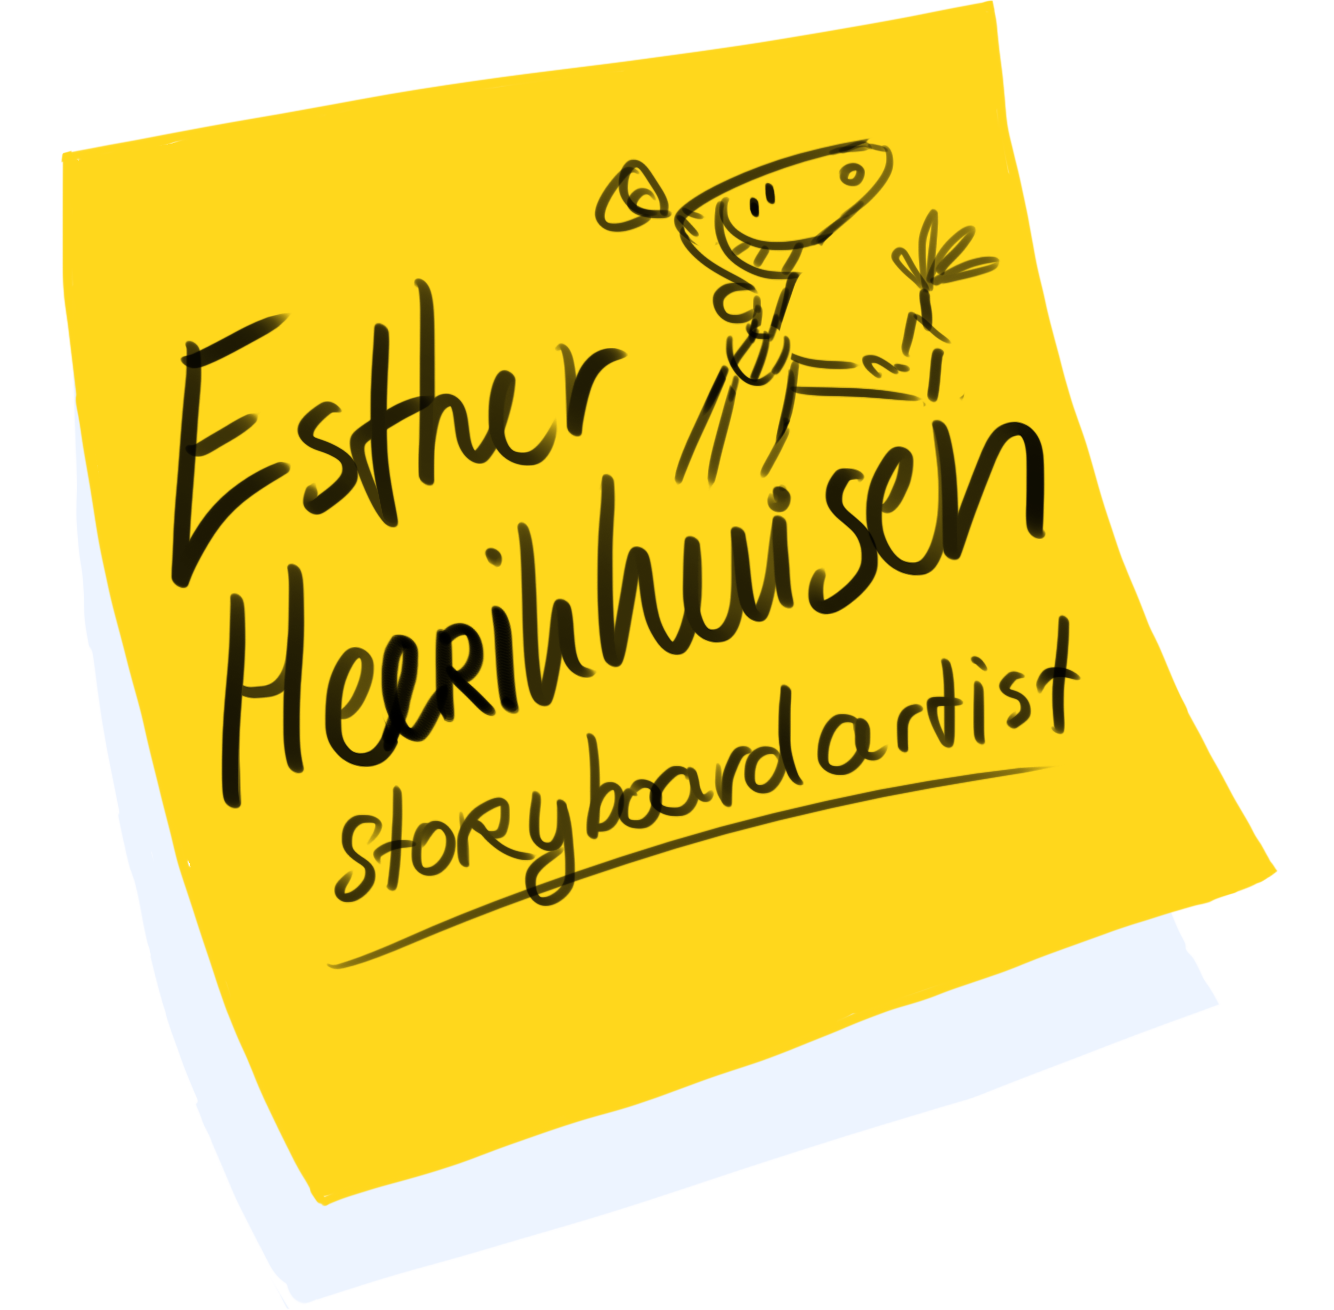 Esther Heerikhuisen